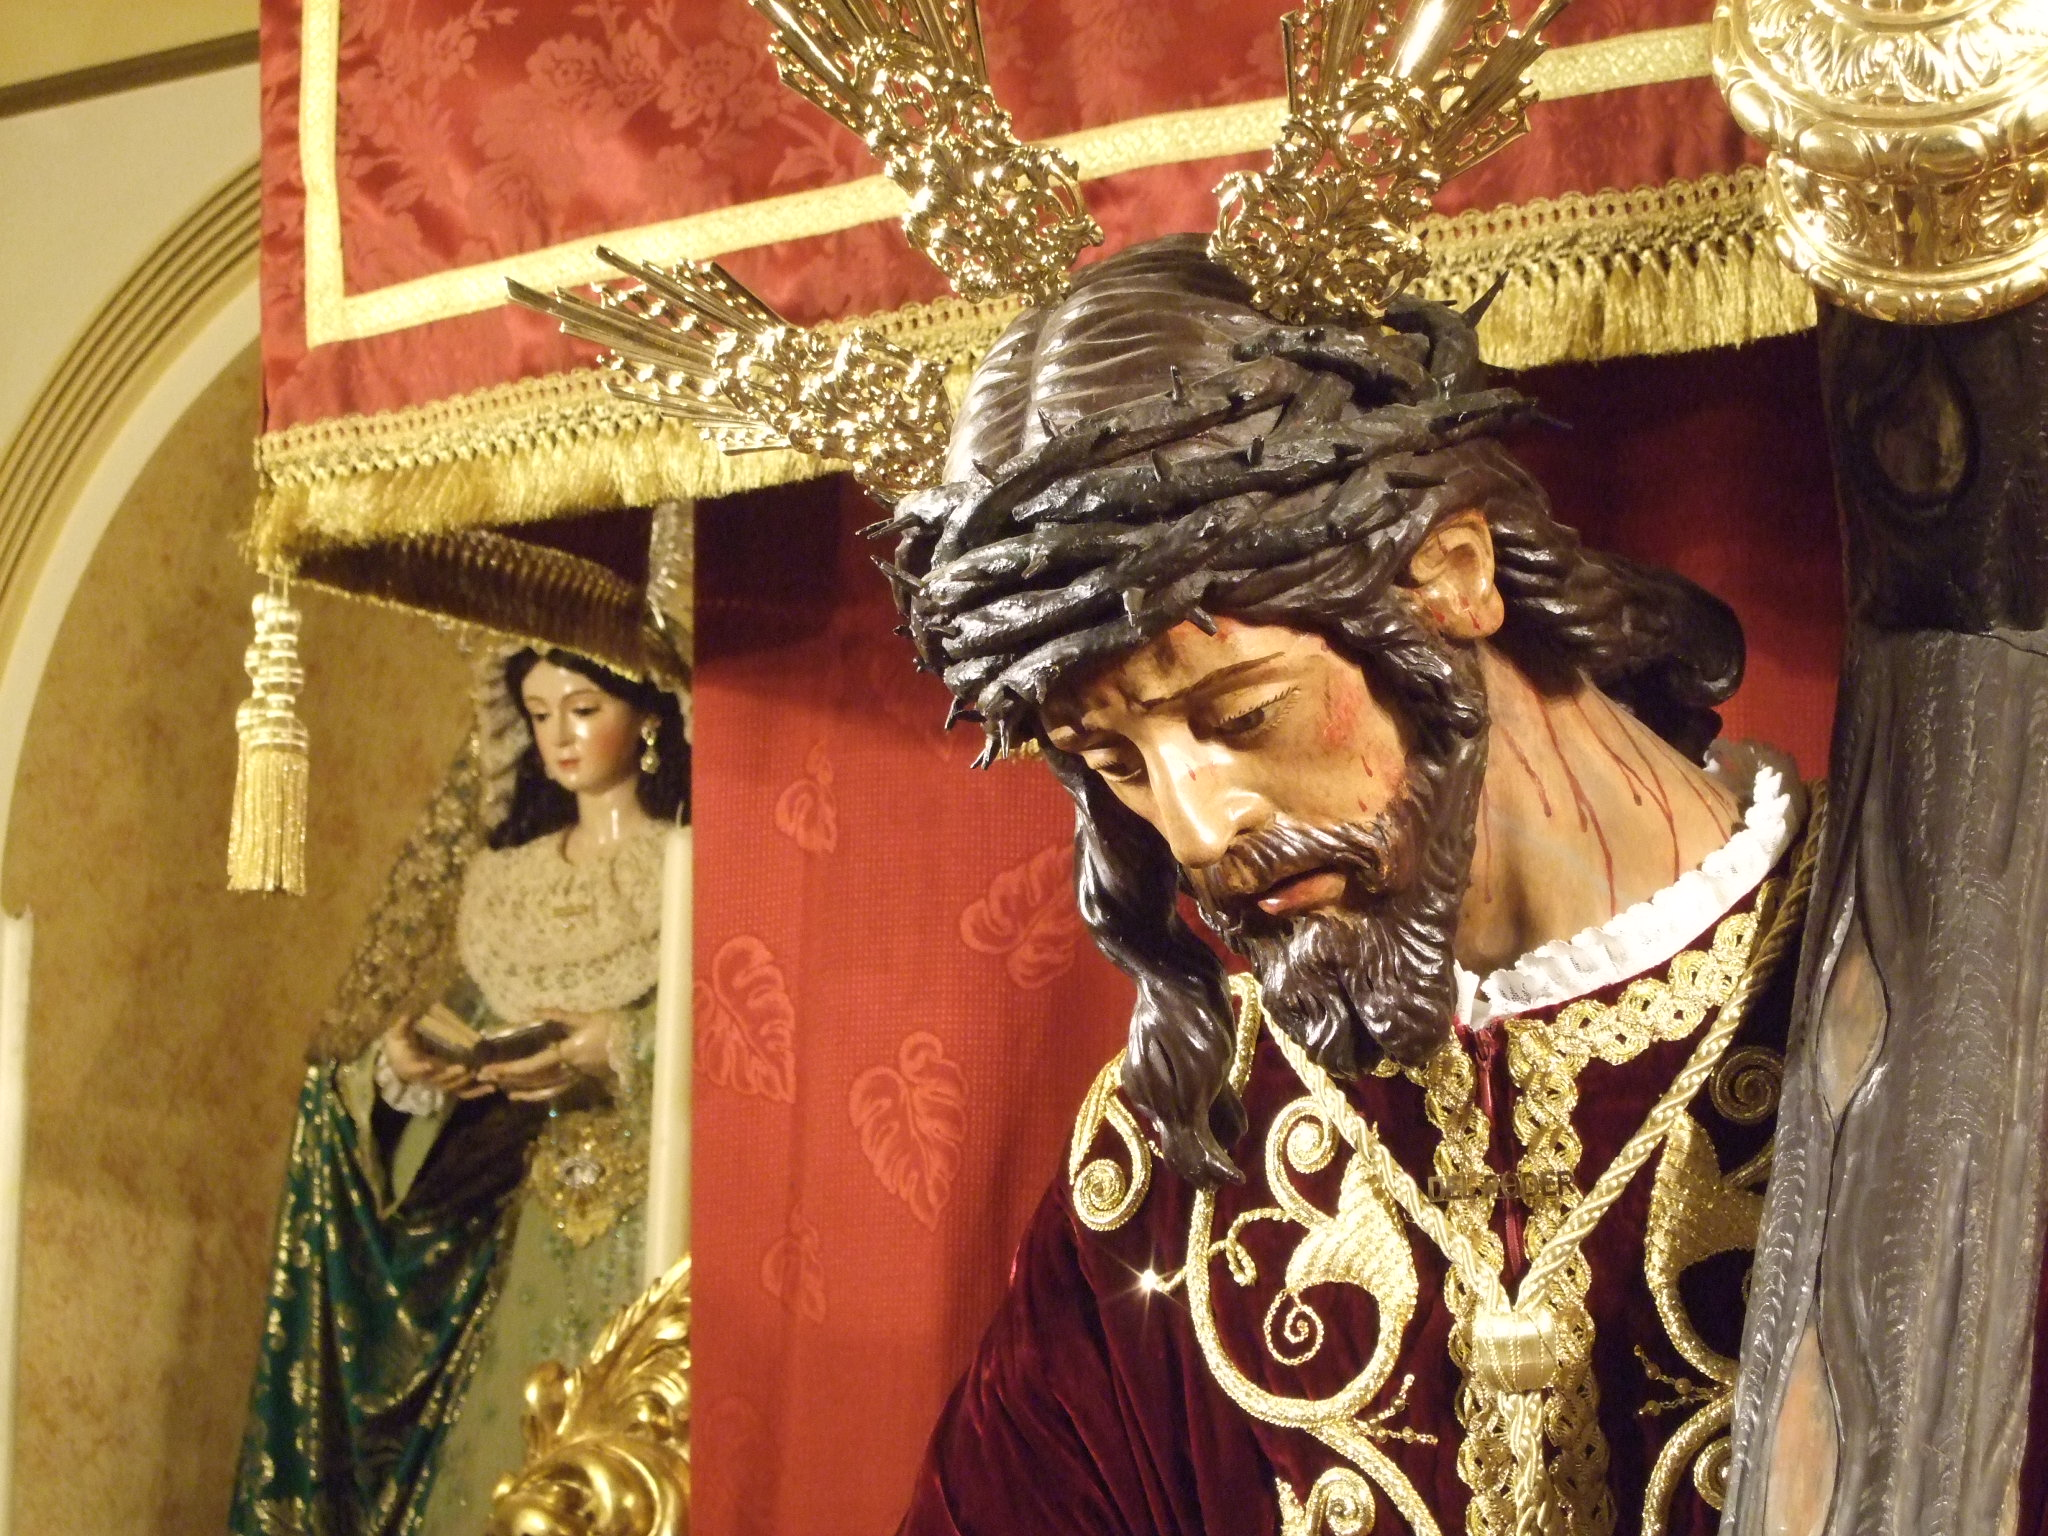 Ntro. Padre Jesús del Poder